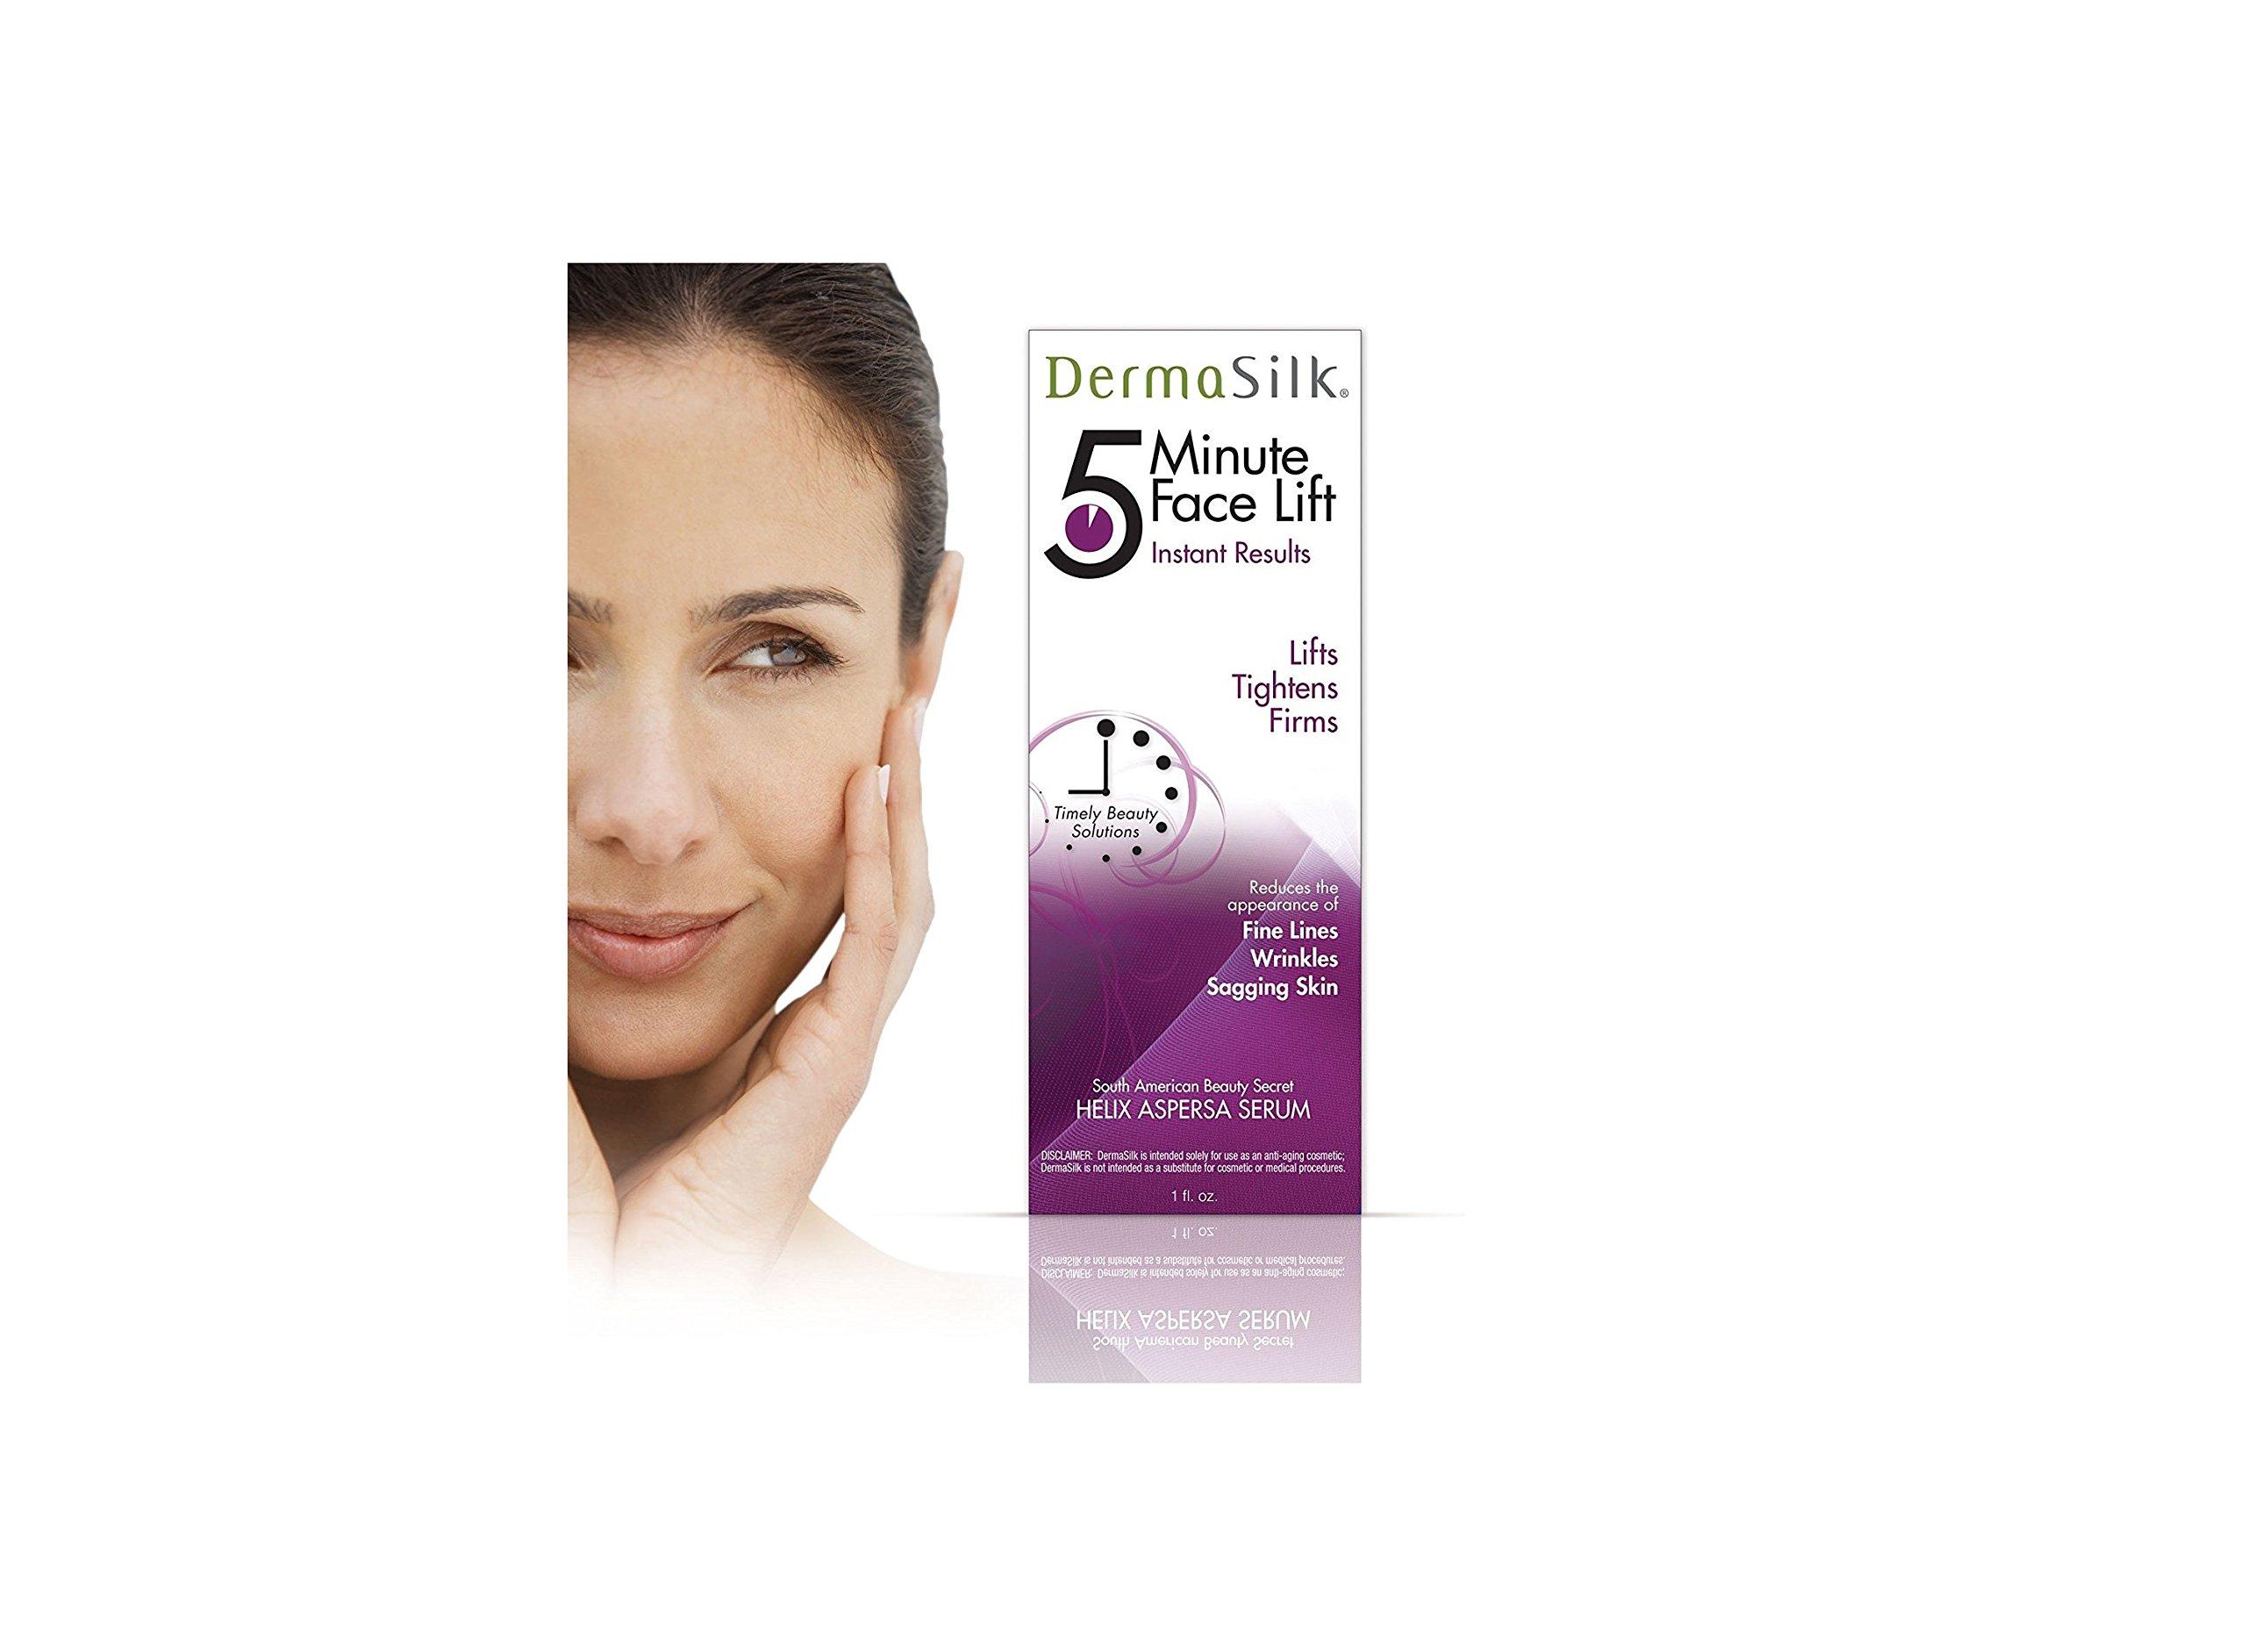 Amazon Dermasilk Anti Aging Skin Care Cream 5 Min Face Lift